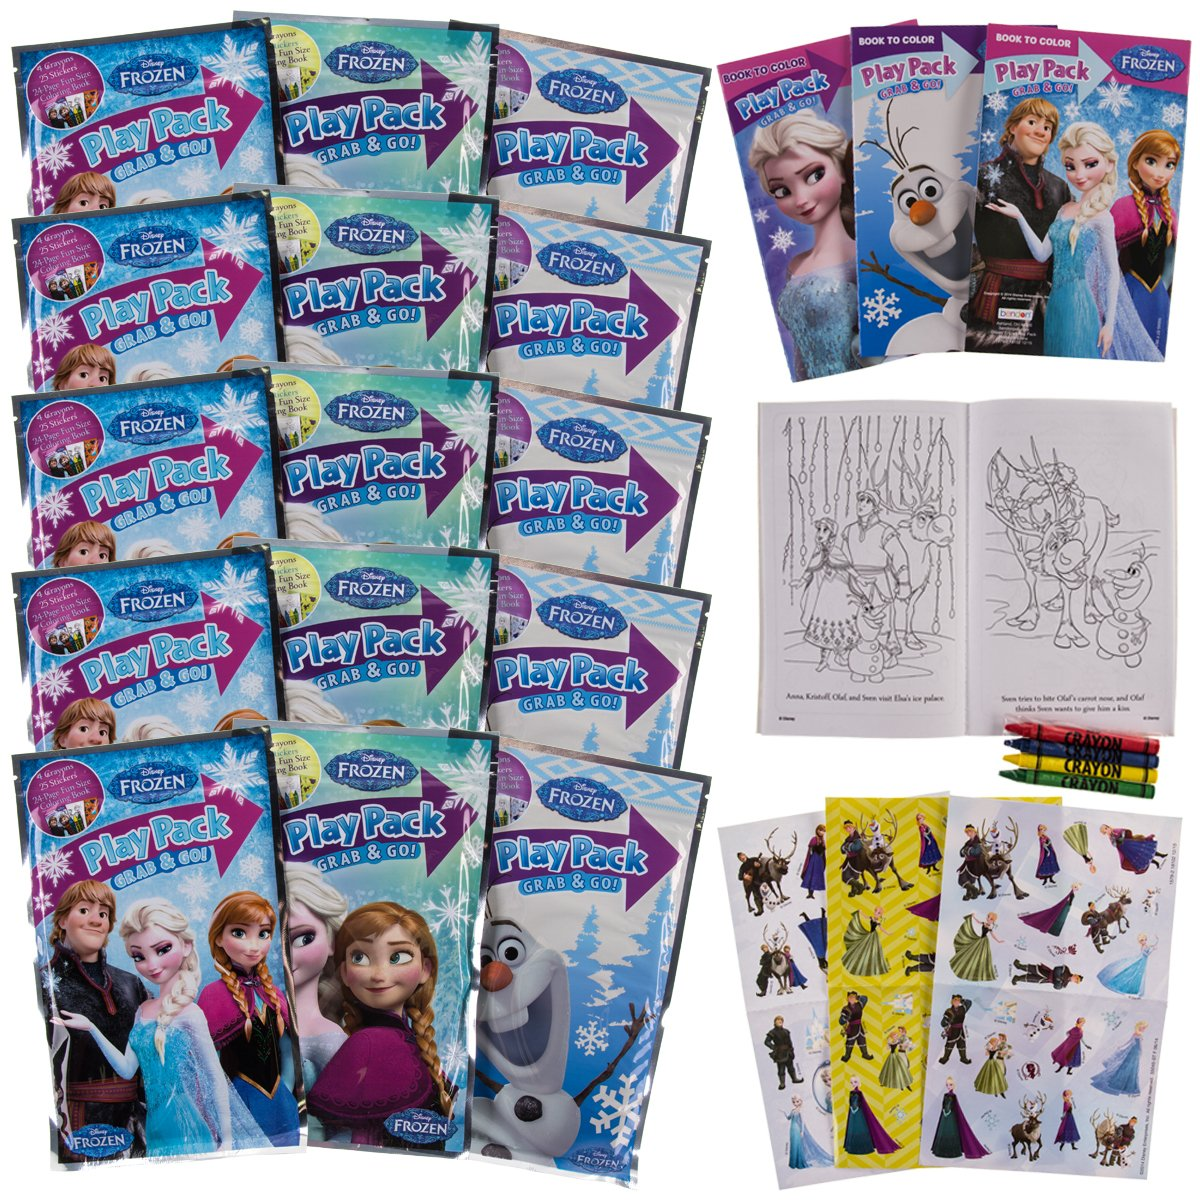 Amazon.com: Set Of 15 Bendon Kids Frozen Play Fun Party Favors Packs ...